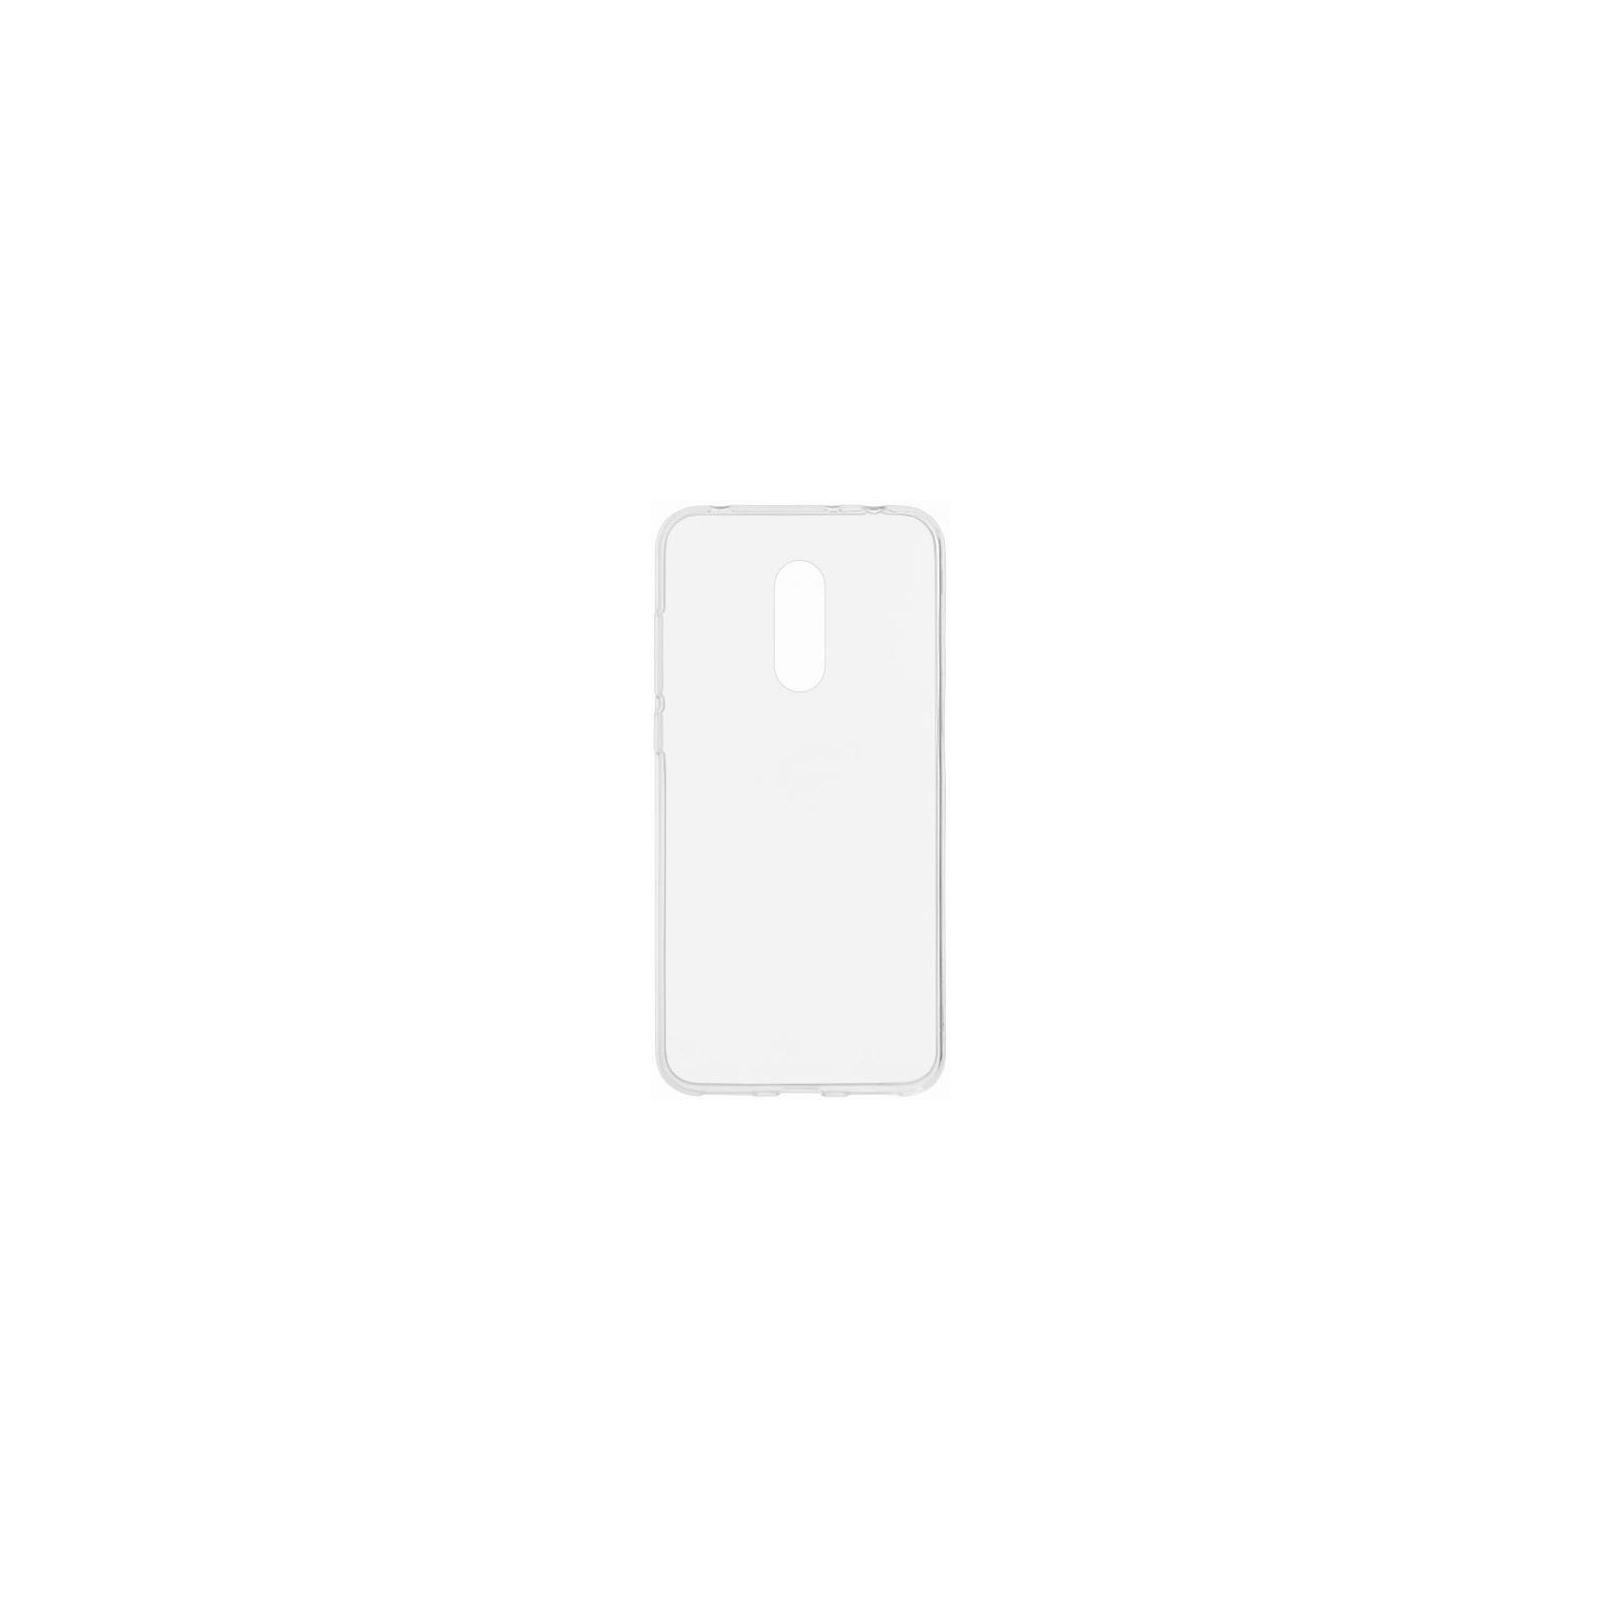 Чехол для моб. телефона Drobak Xiaomi Redmi 5 (223107)